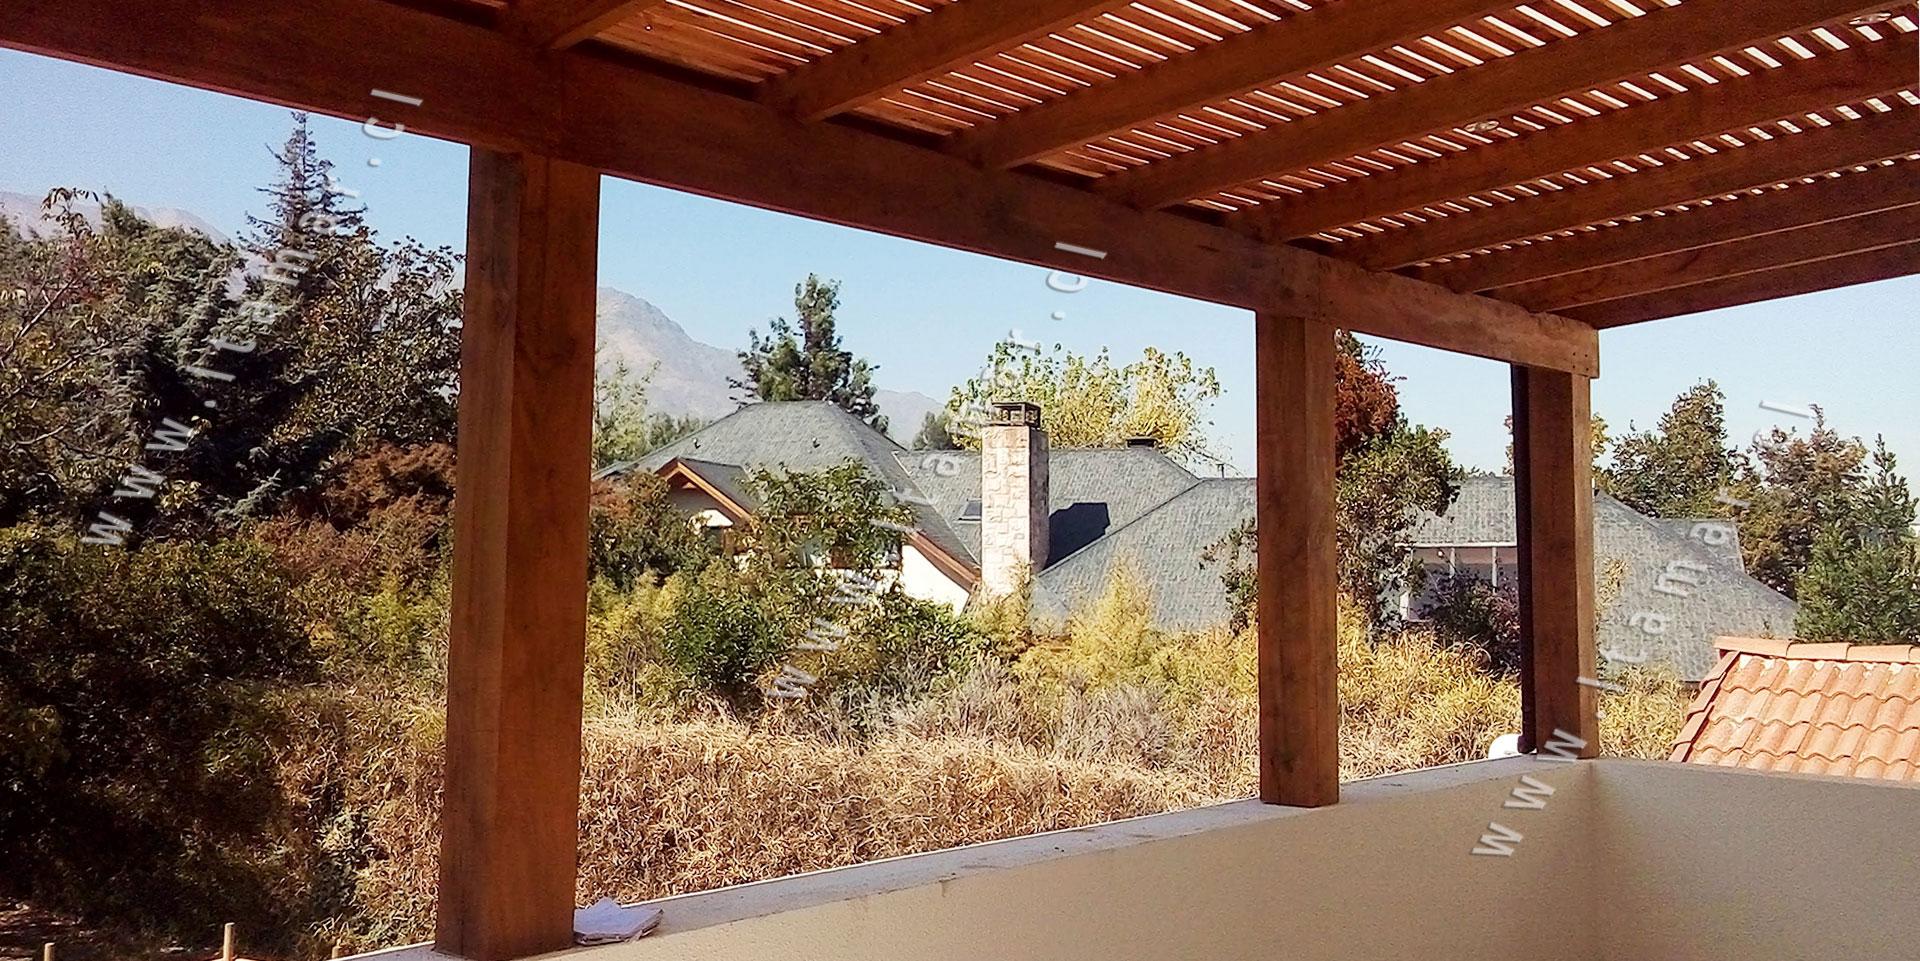 Estructuras de roble cobertizos de madera techos de for Cobertizo de madera ideas de disenos